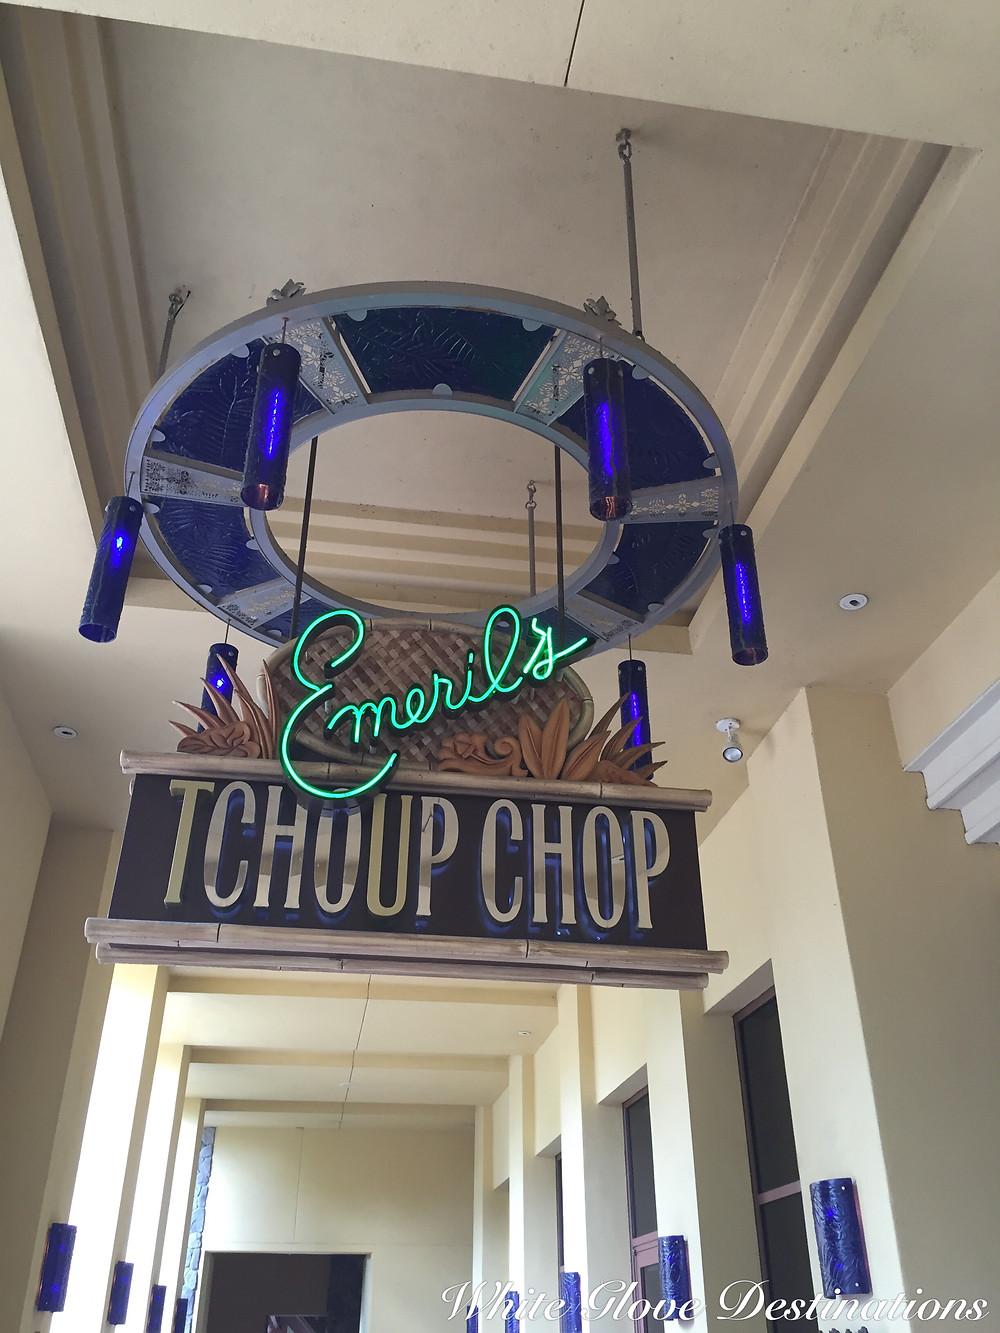 Emeralds TCHOUP CHOP